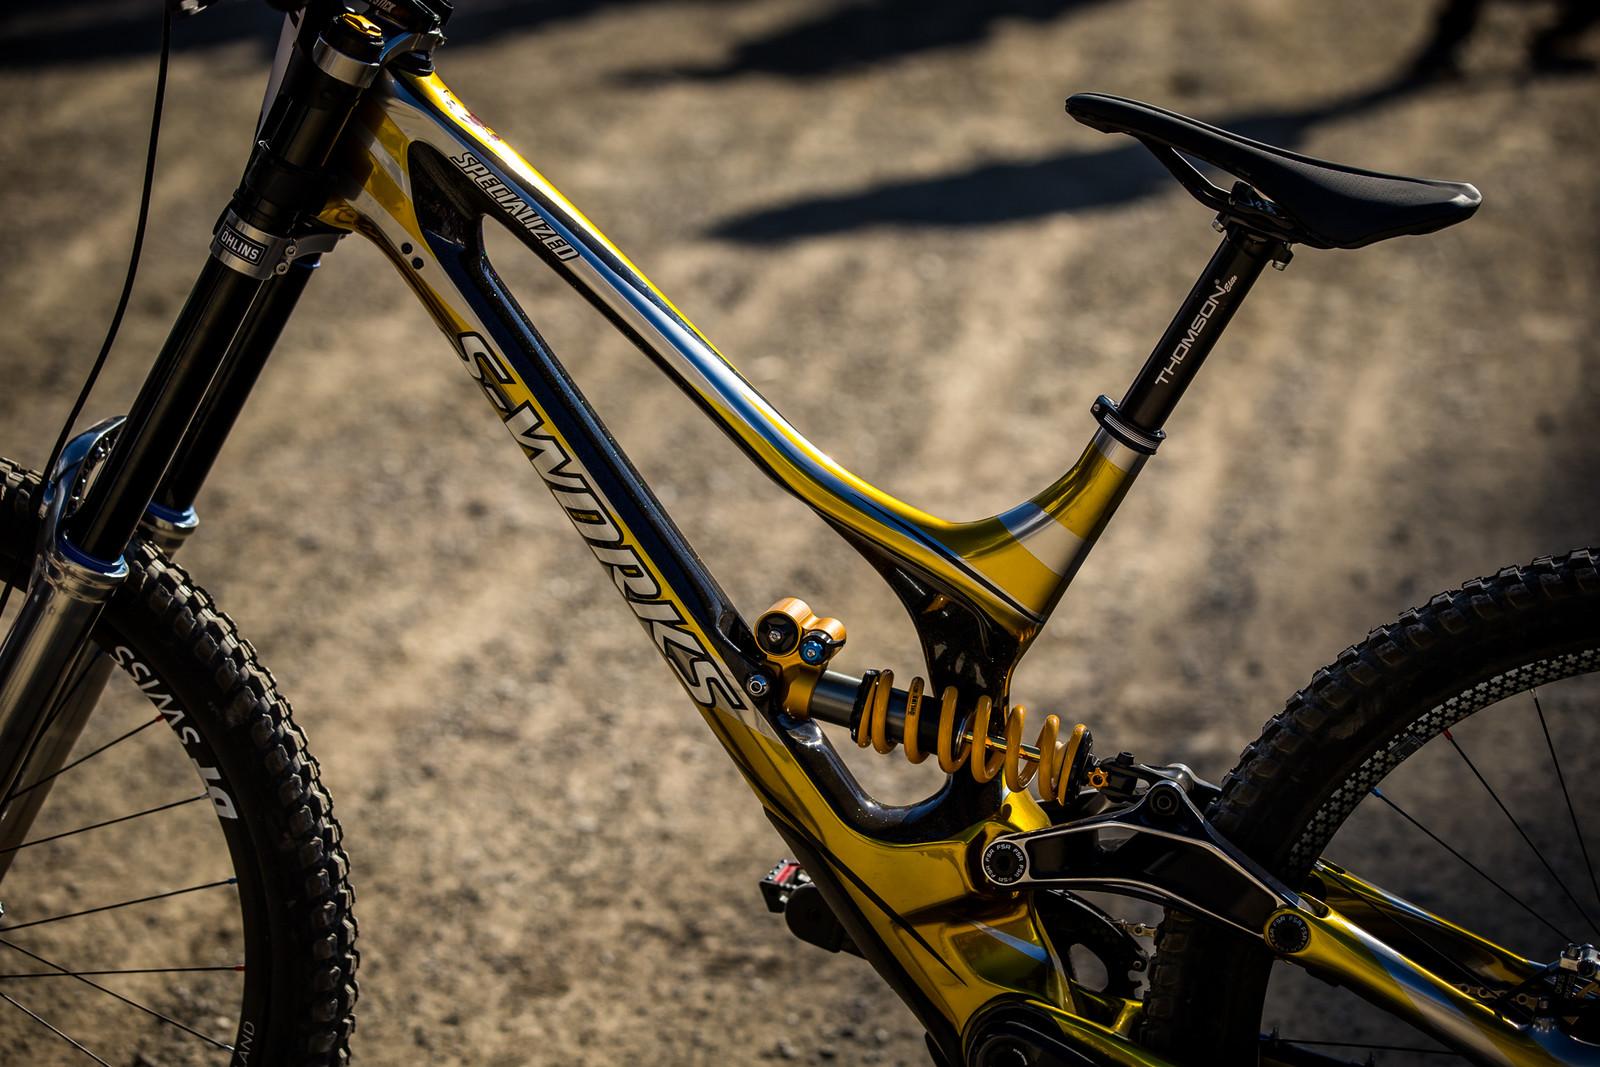 Non-Drive Side - WINNING BIKE - Loic Bruni's Specialized Demo - Mountain Biking Pictures - Vital MTB